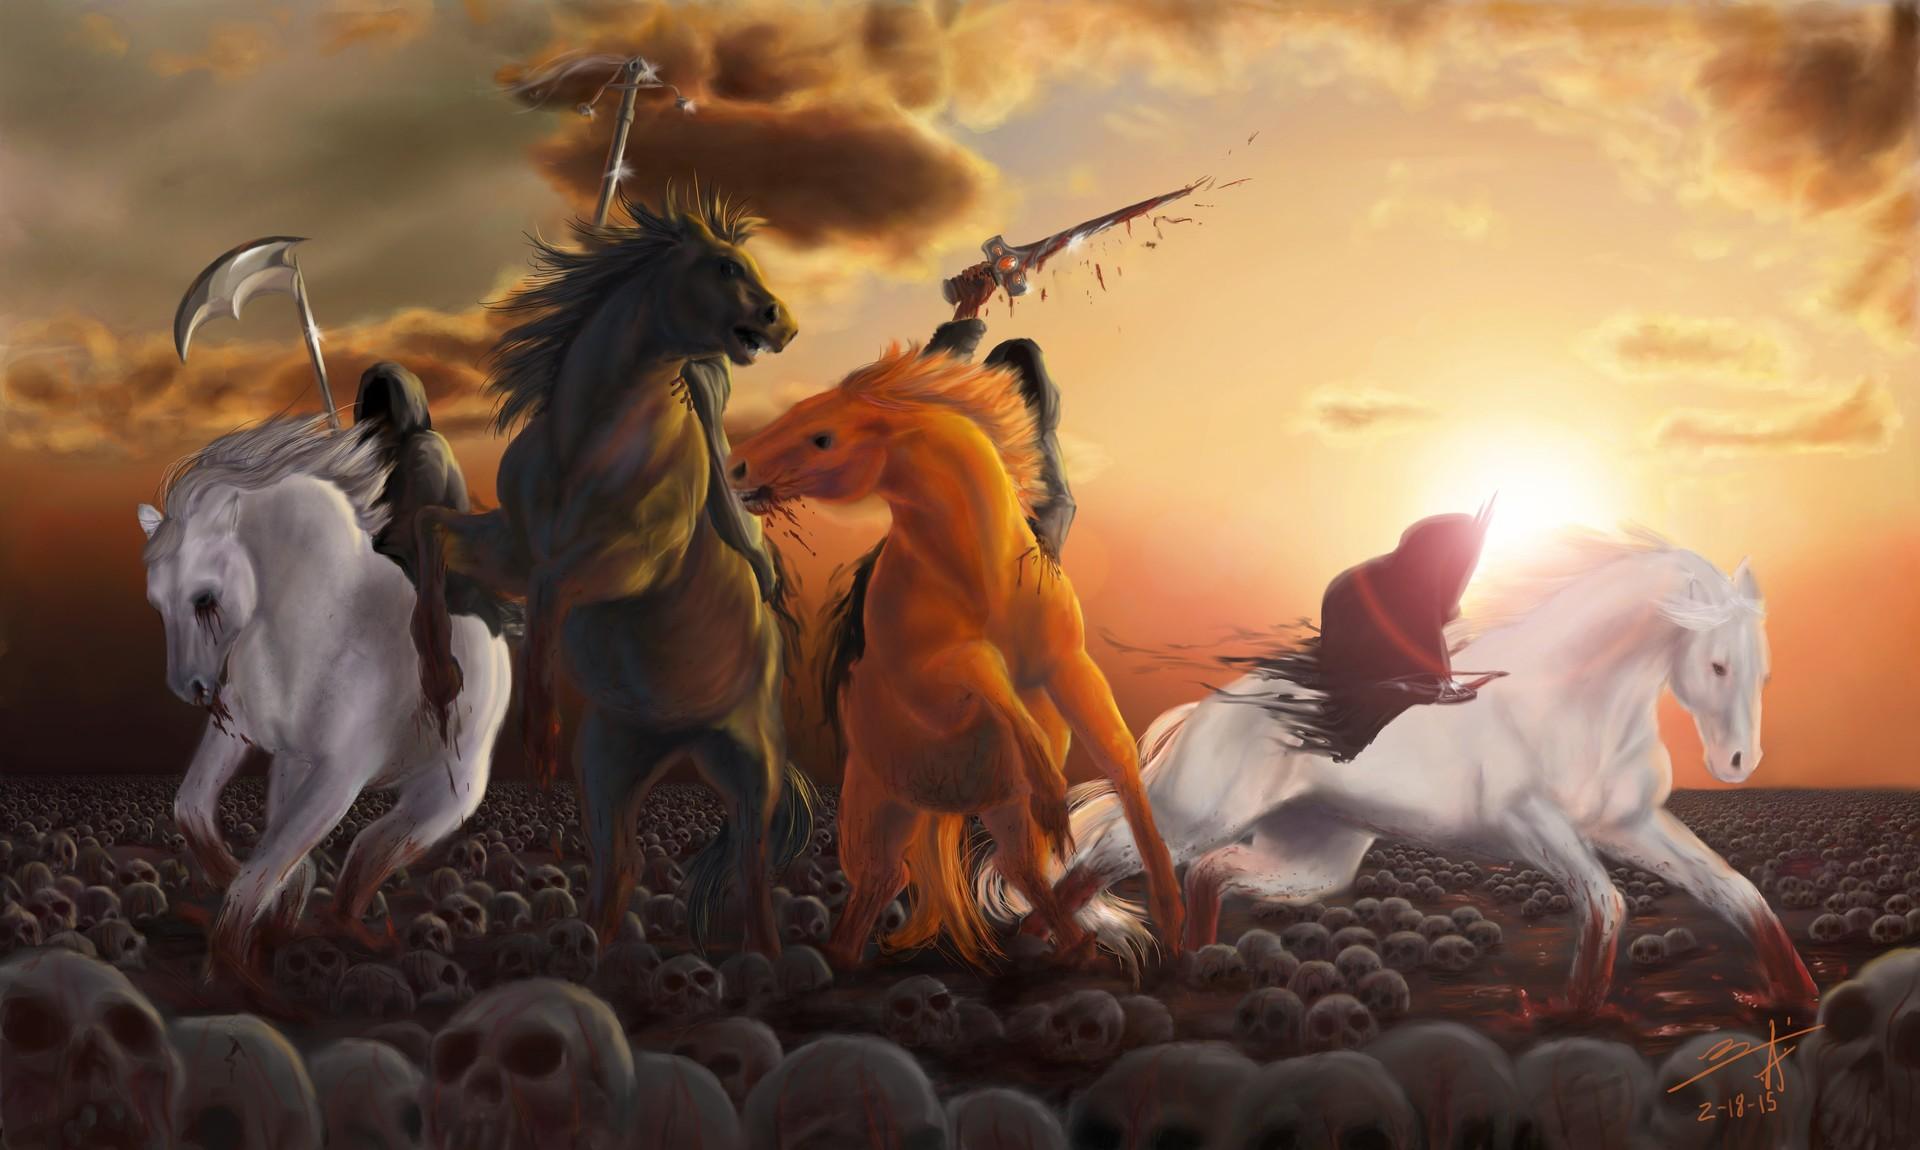 ArtStation - Four Horsemen of the Apocalypse, Tianna Palmer